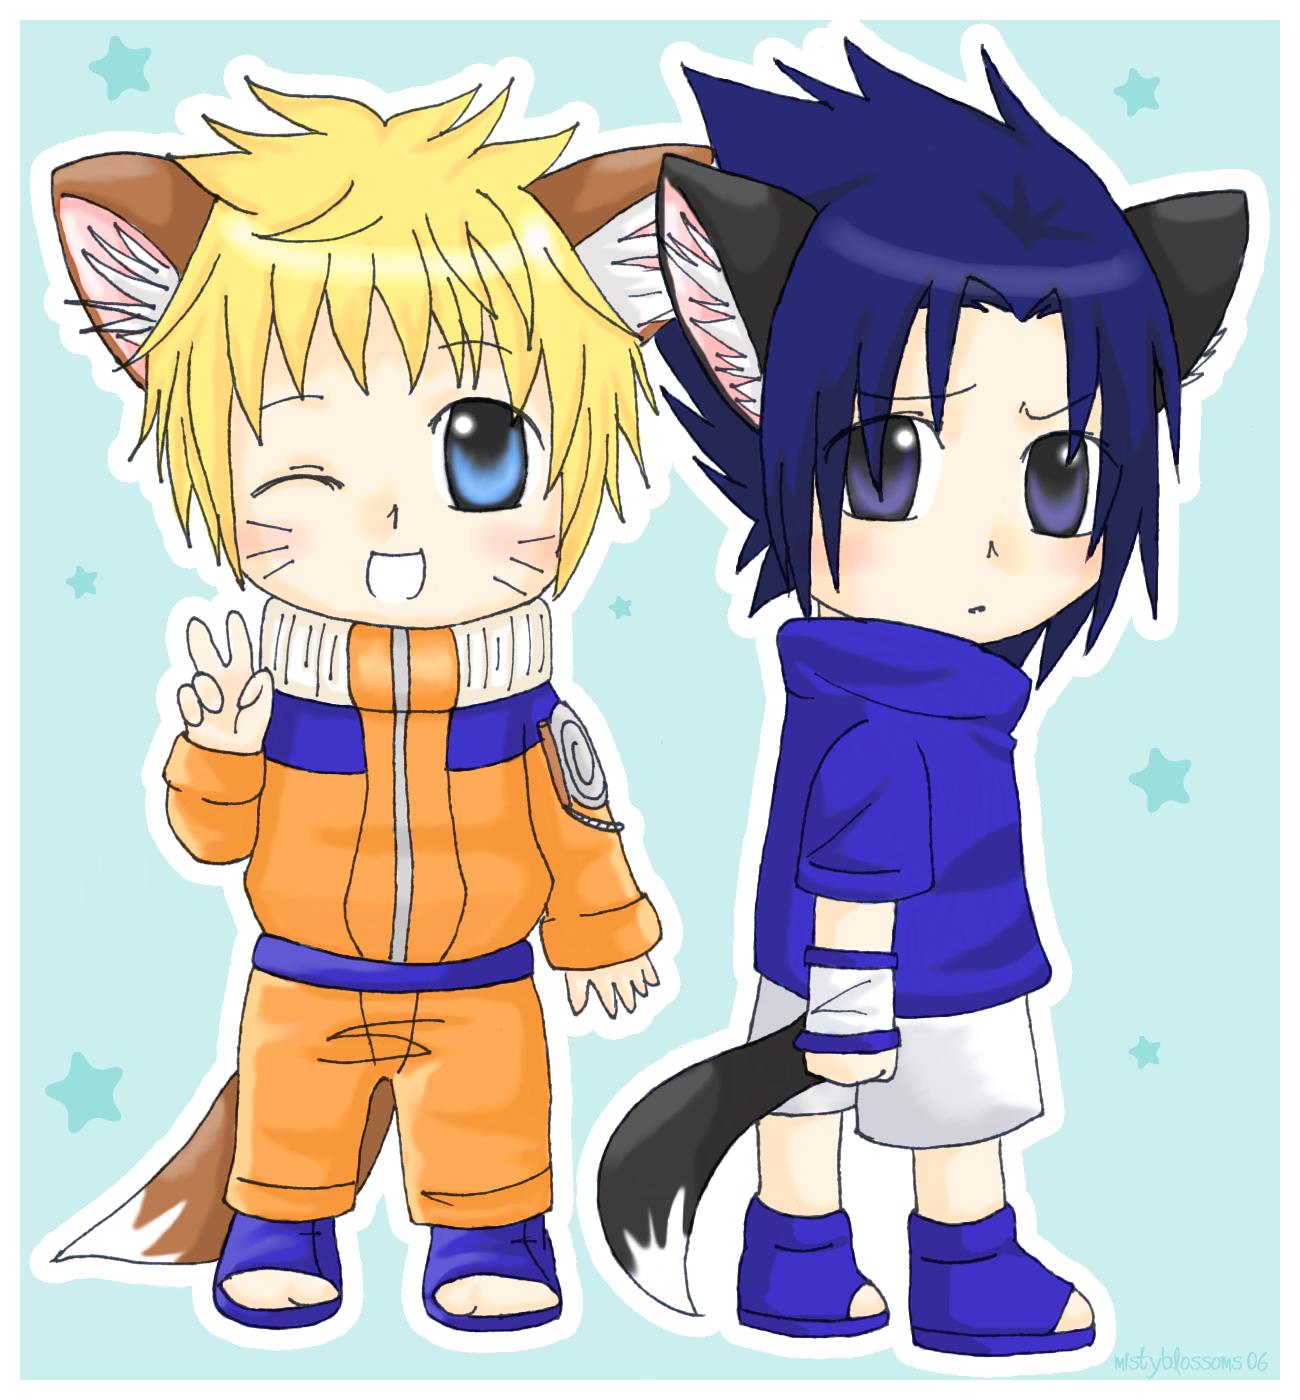 _Chibi_Naruto_and_Sasuke__by_mistyblossoms